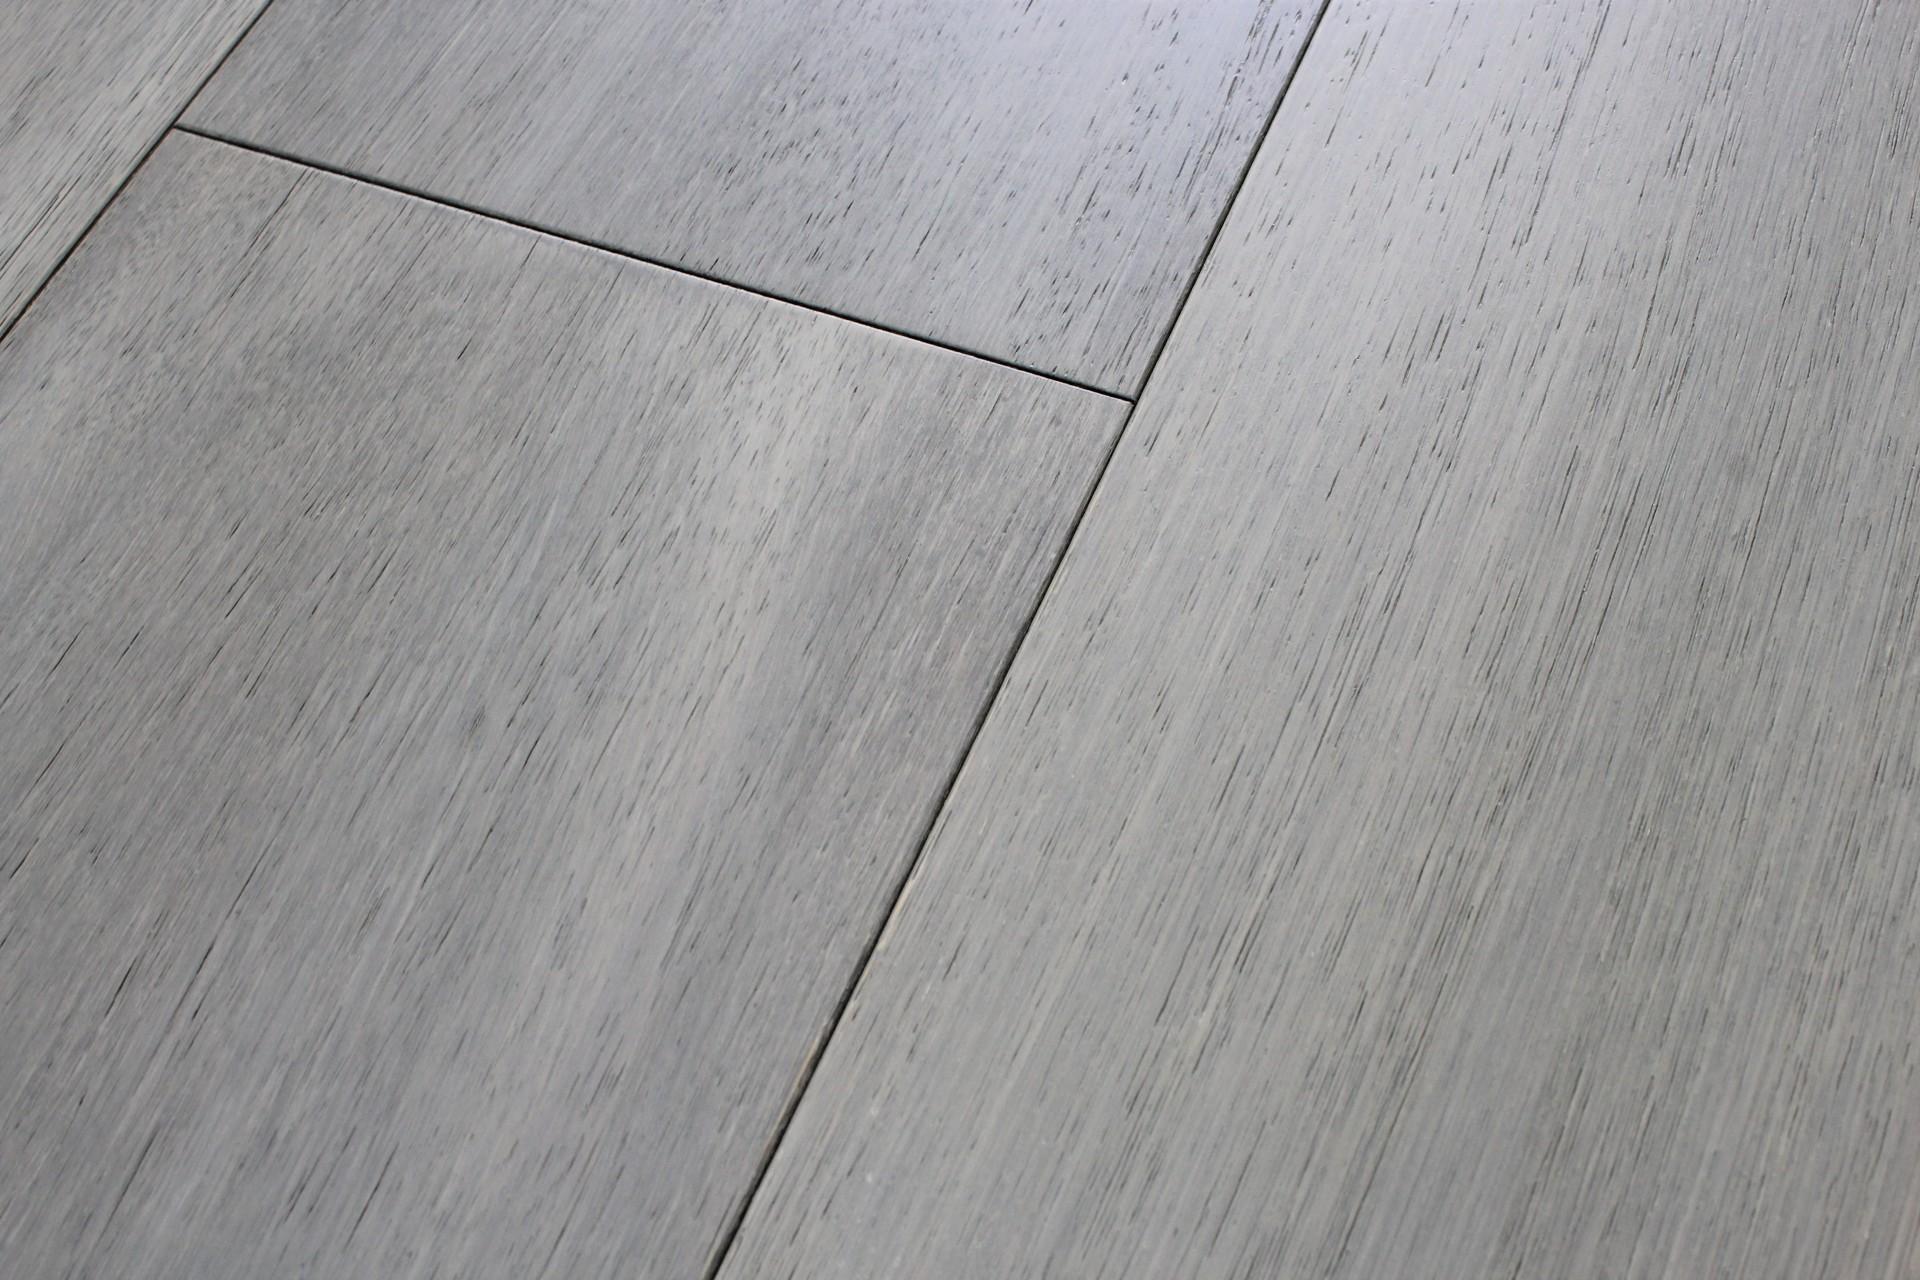 Hardwood, prefinished floor, engineered wood, solid wood, lifestyle, hard surface, prefinished hardwood, prefinished wood, home, design, interior design, wood floor design, chesapeake hardwood